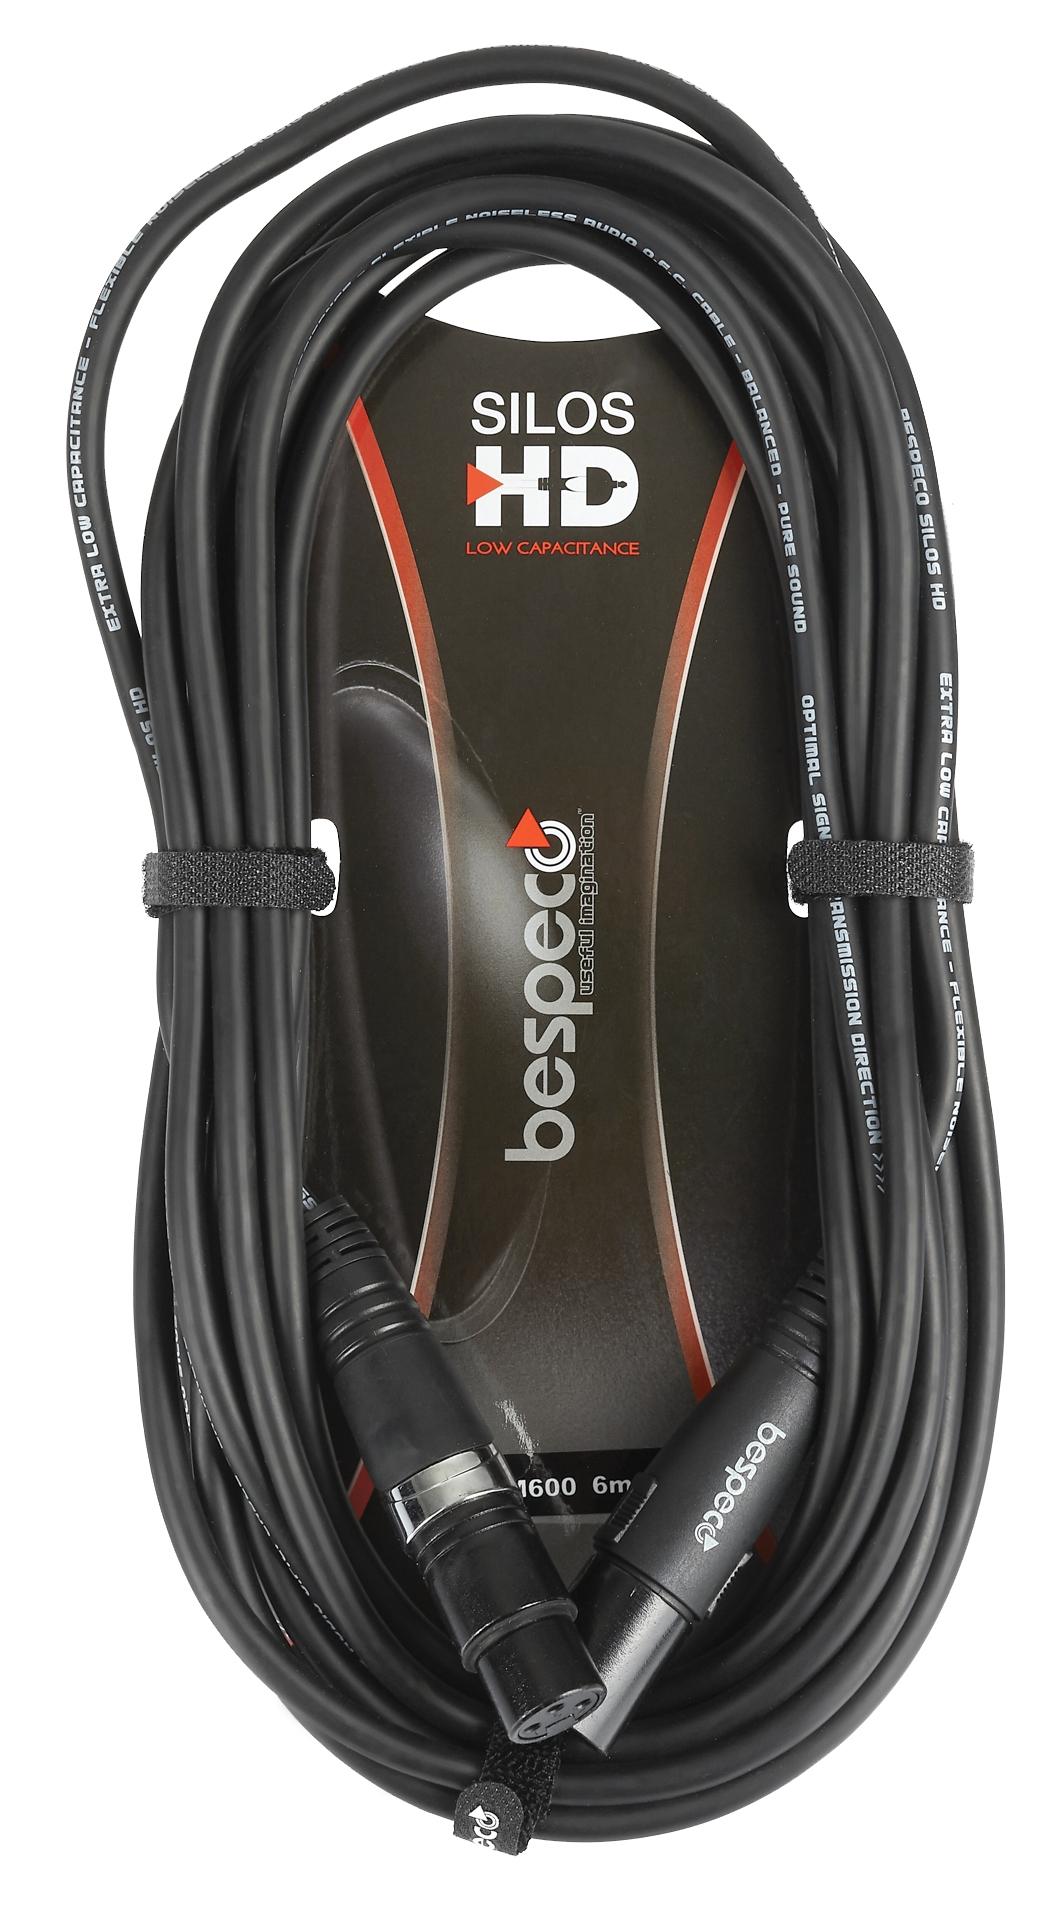 BESPECO HDFM600